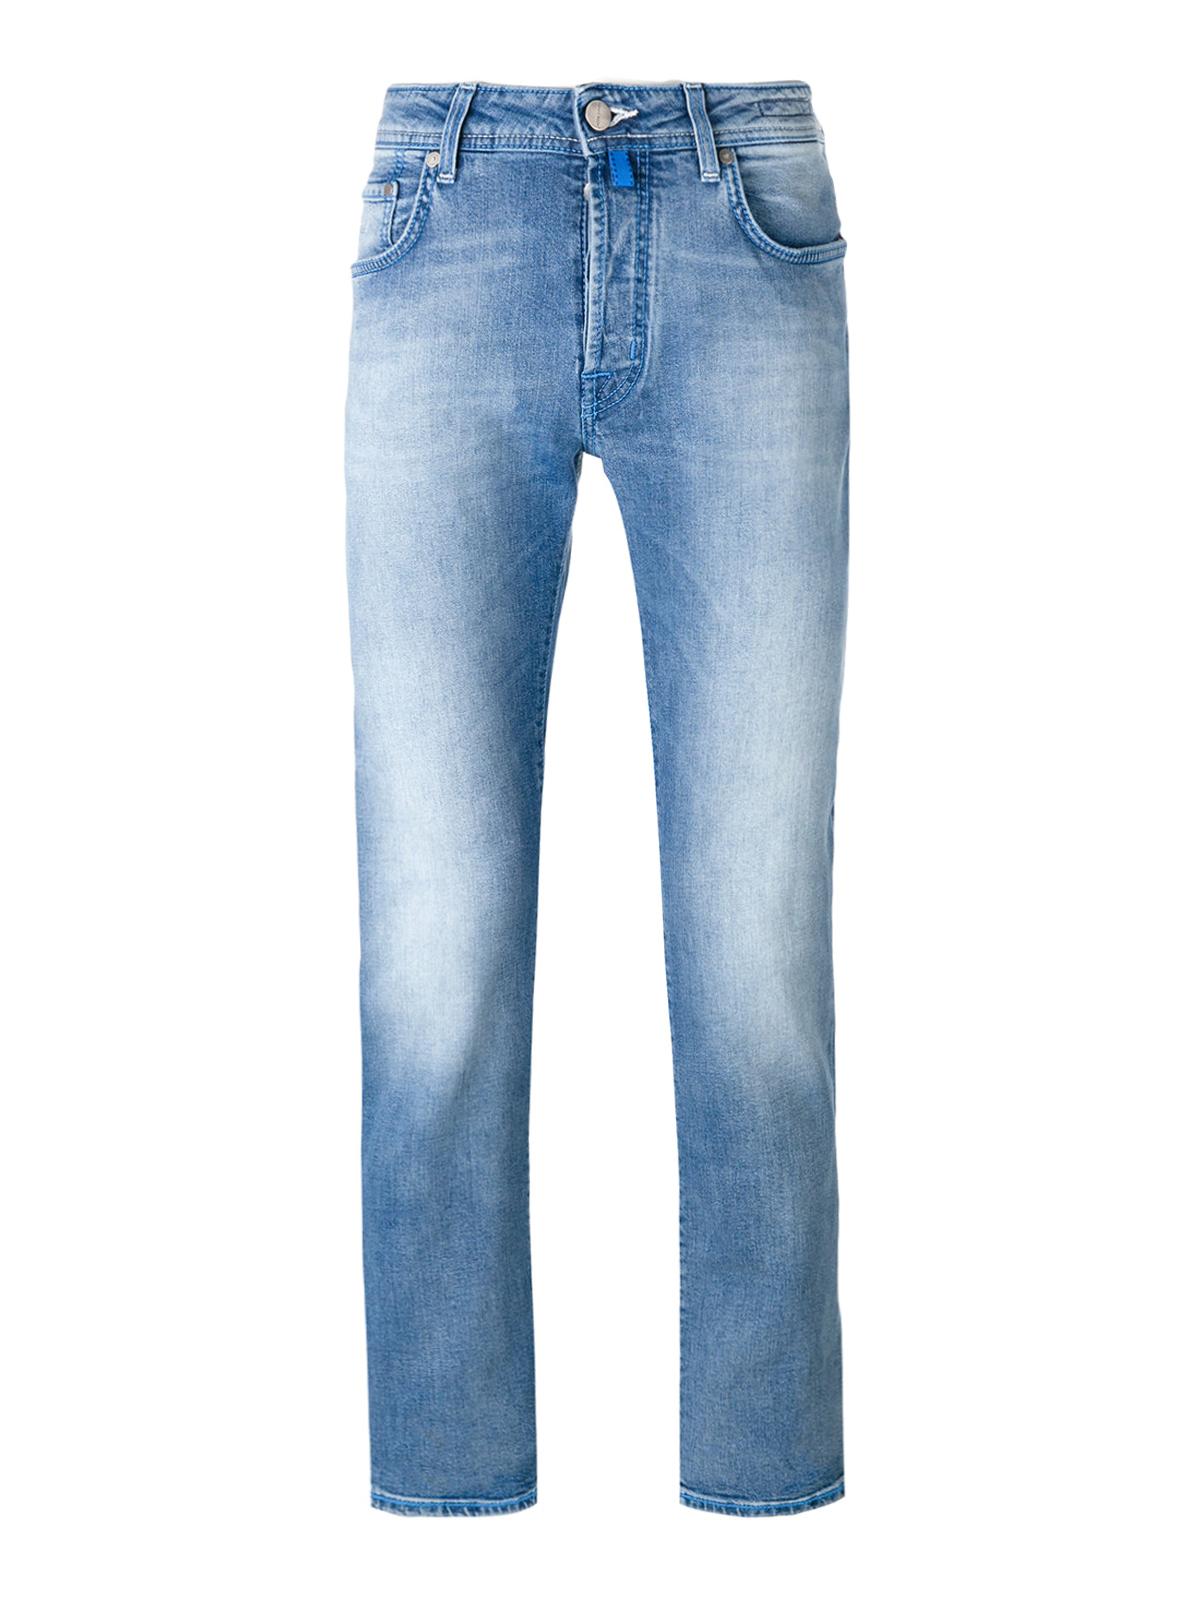 Faded denim tailored jeans by jacob cohen straight leg - Jacob cohen denim ...